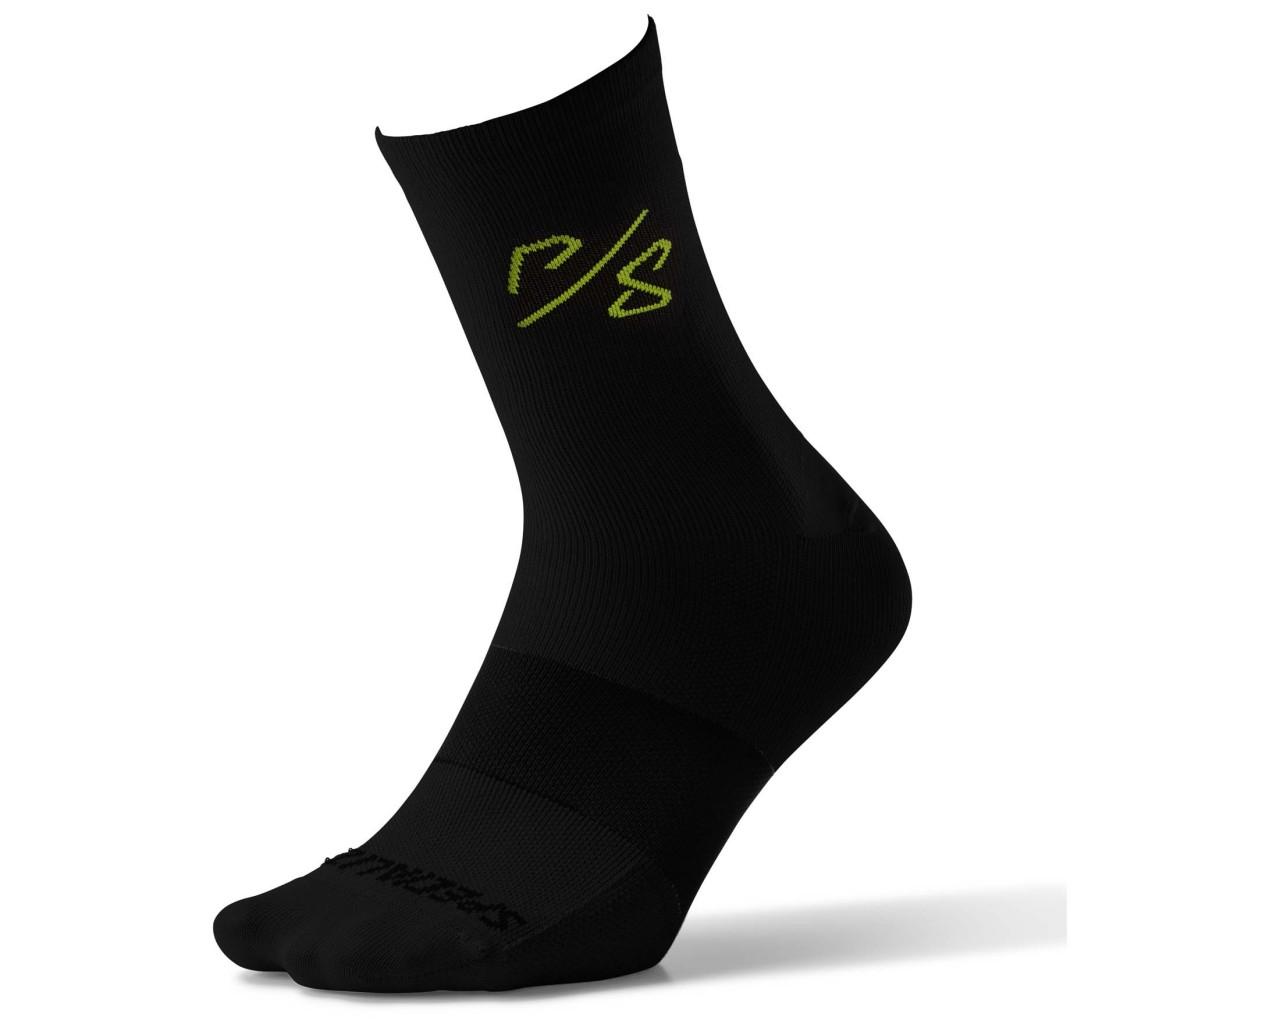 Specialized Soft Air Tall Socks Sagan Deconconstrustivism Green | black